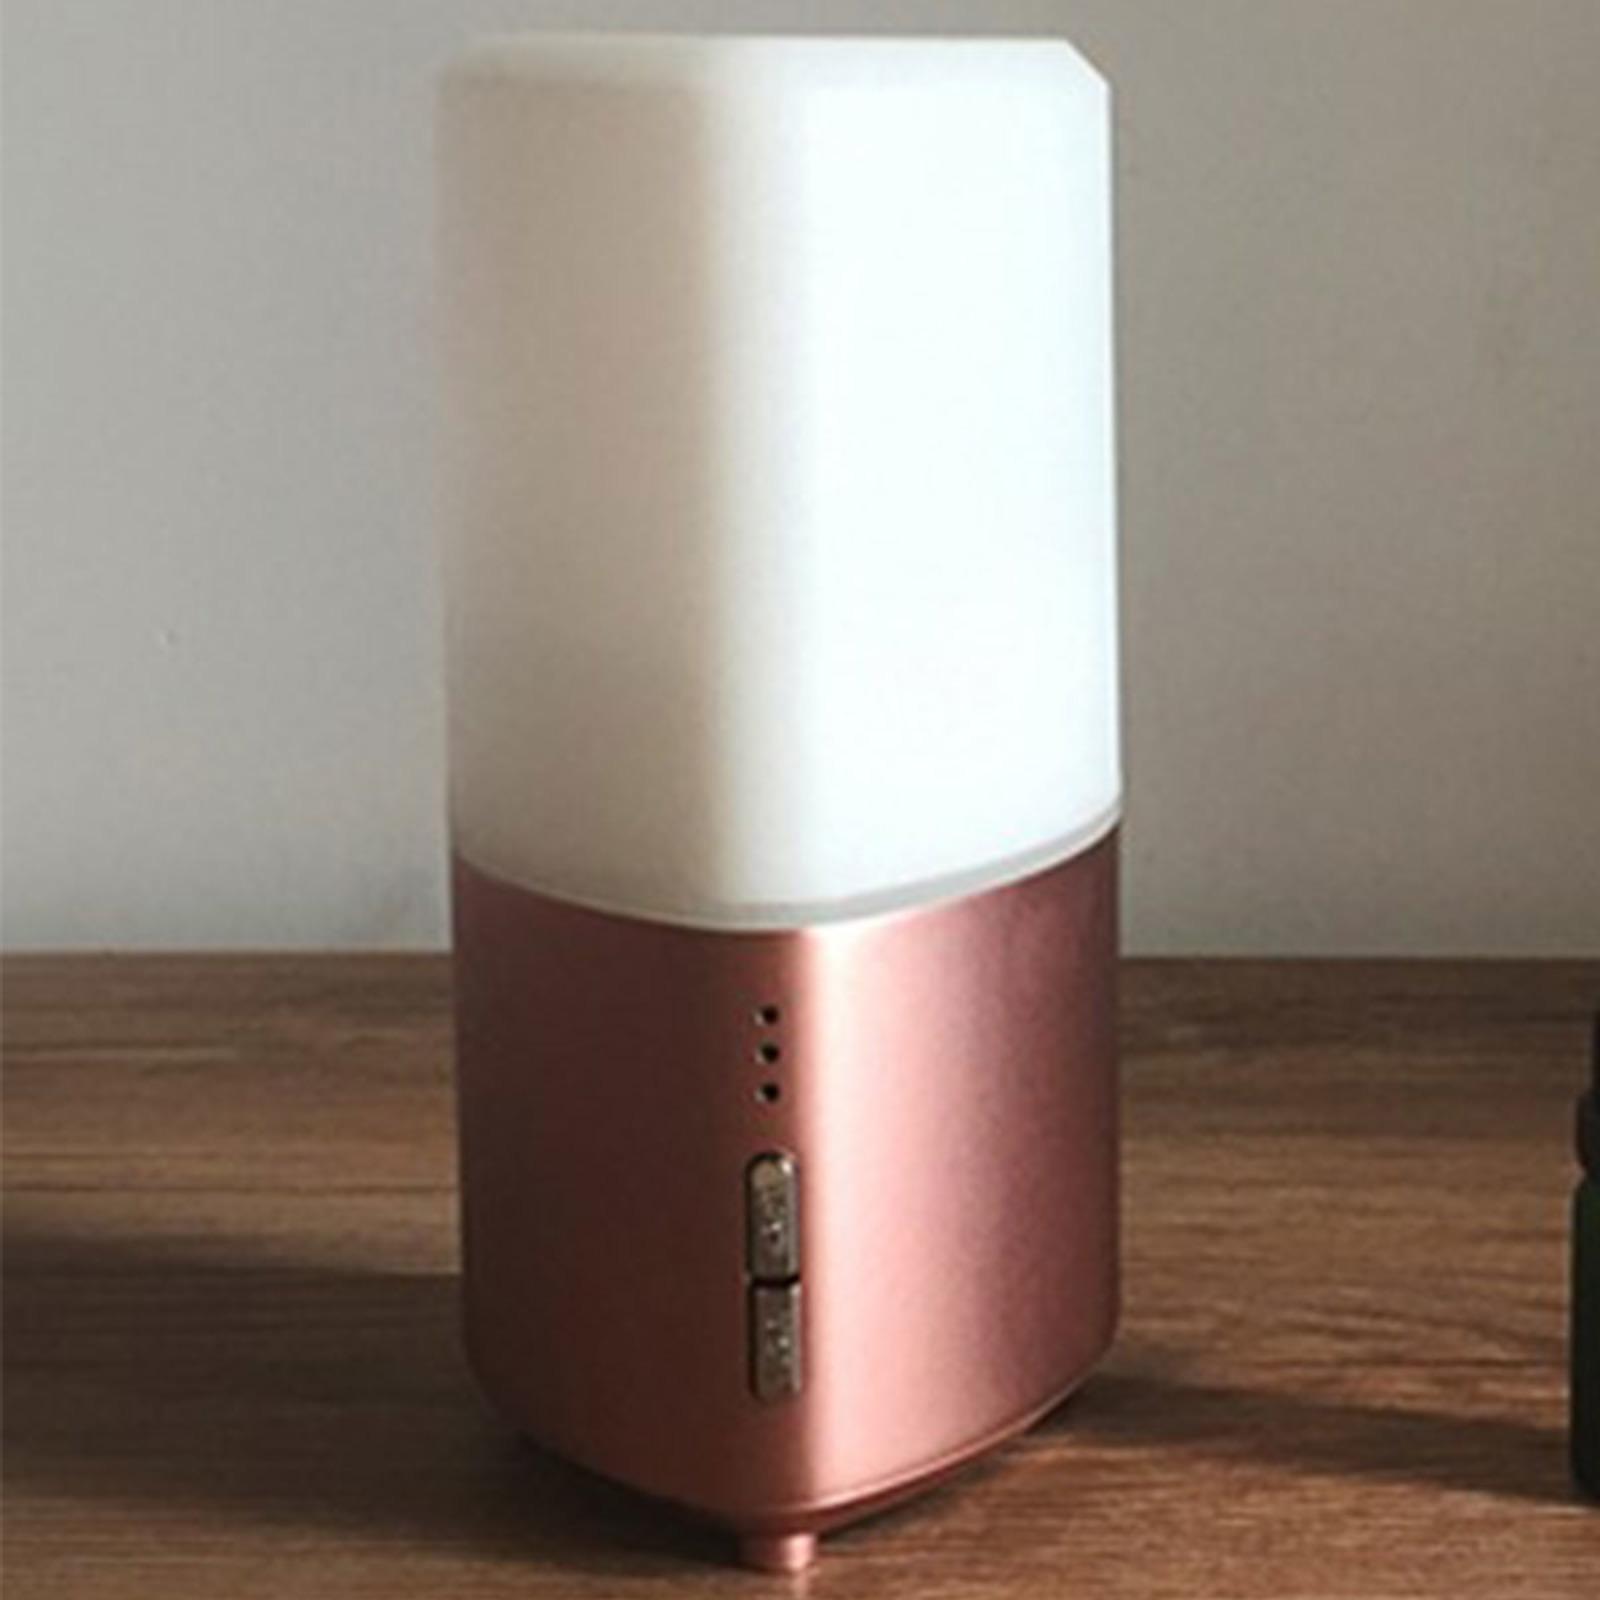 Biofinest H1 Ultrasonic Aroma Diffuser Humidifier